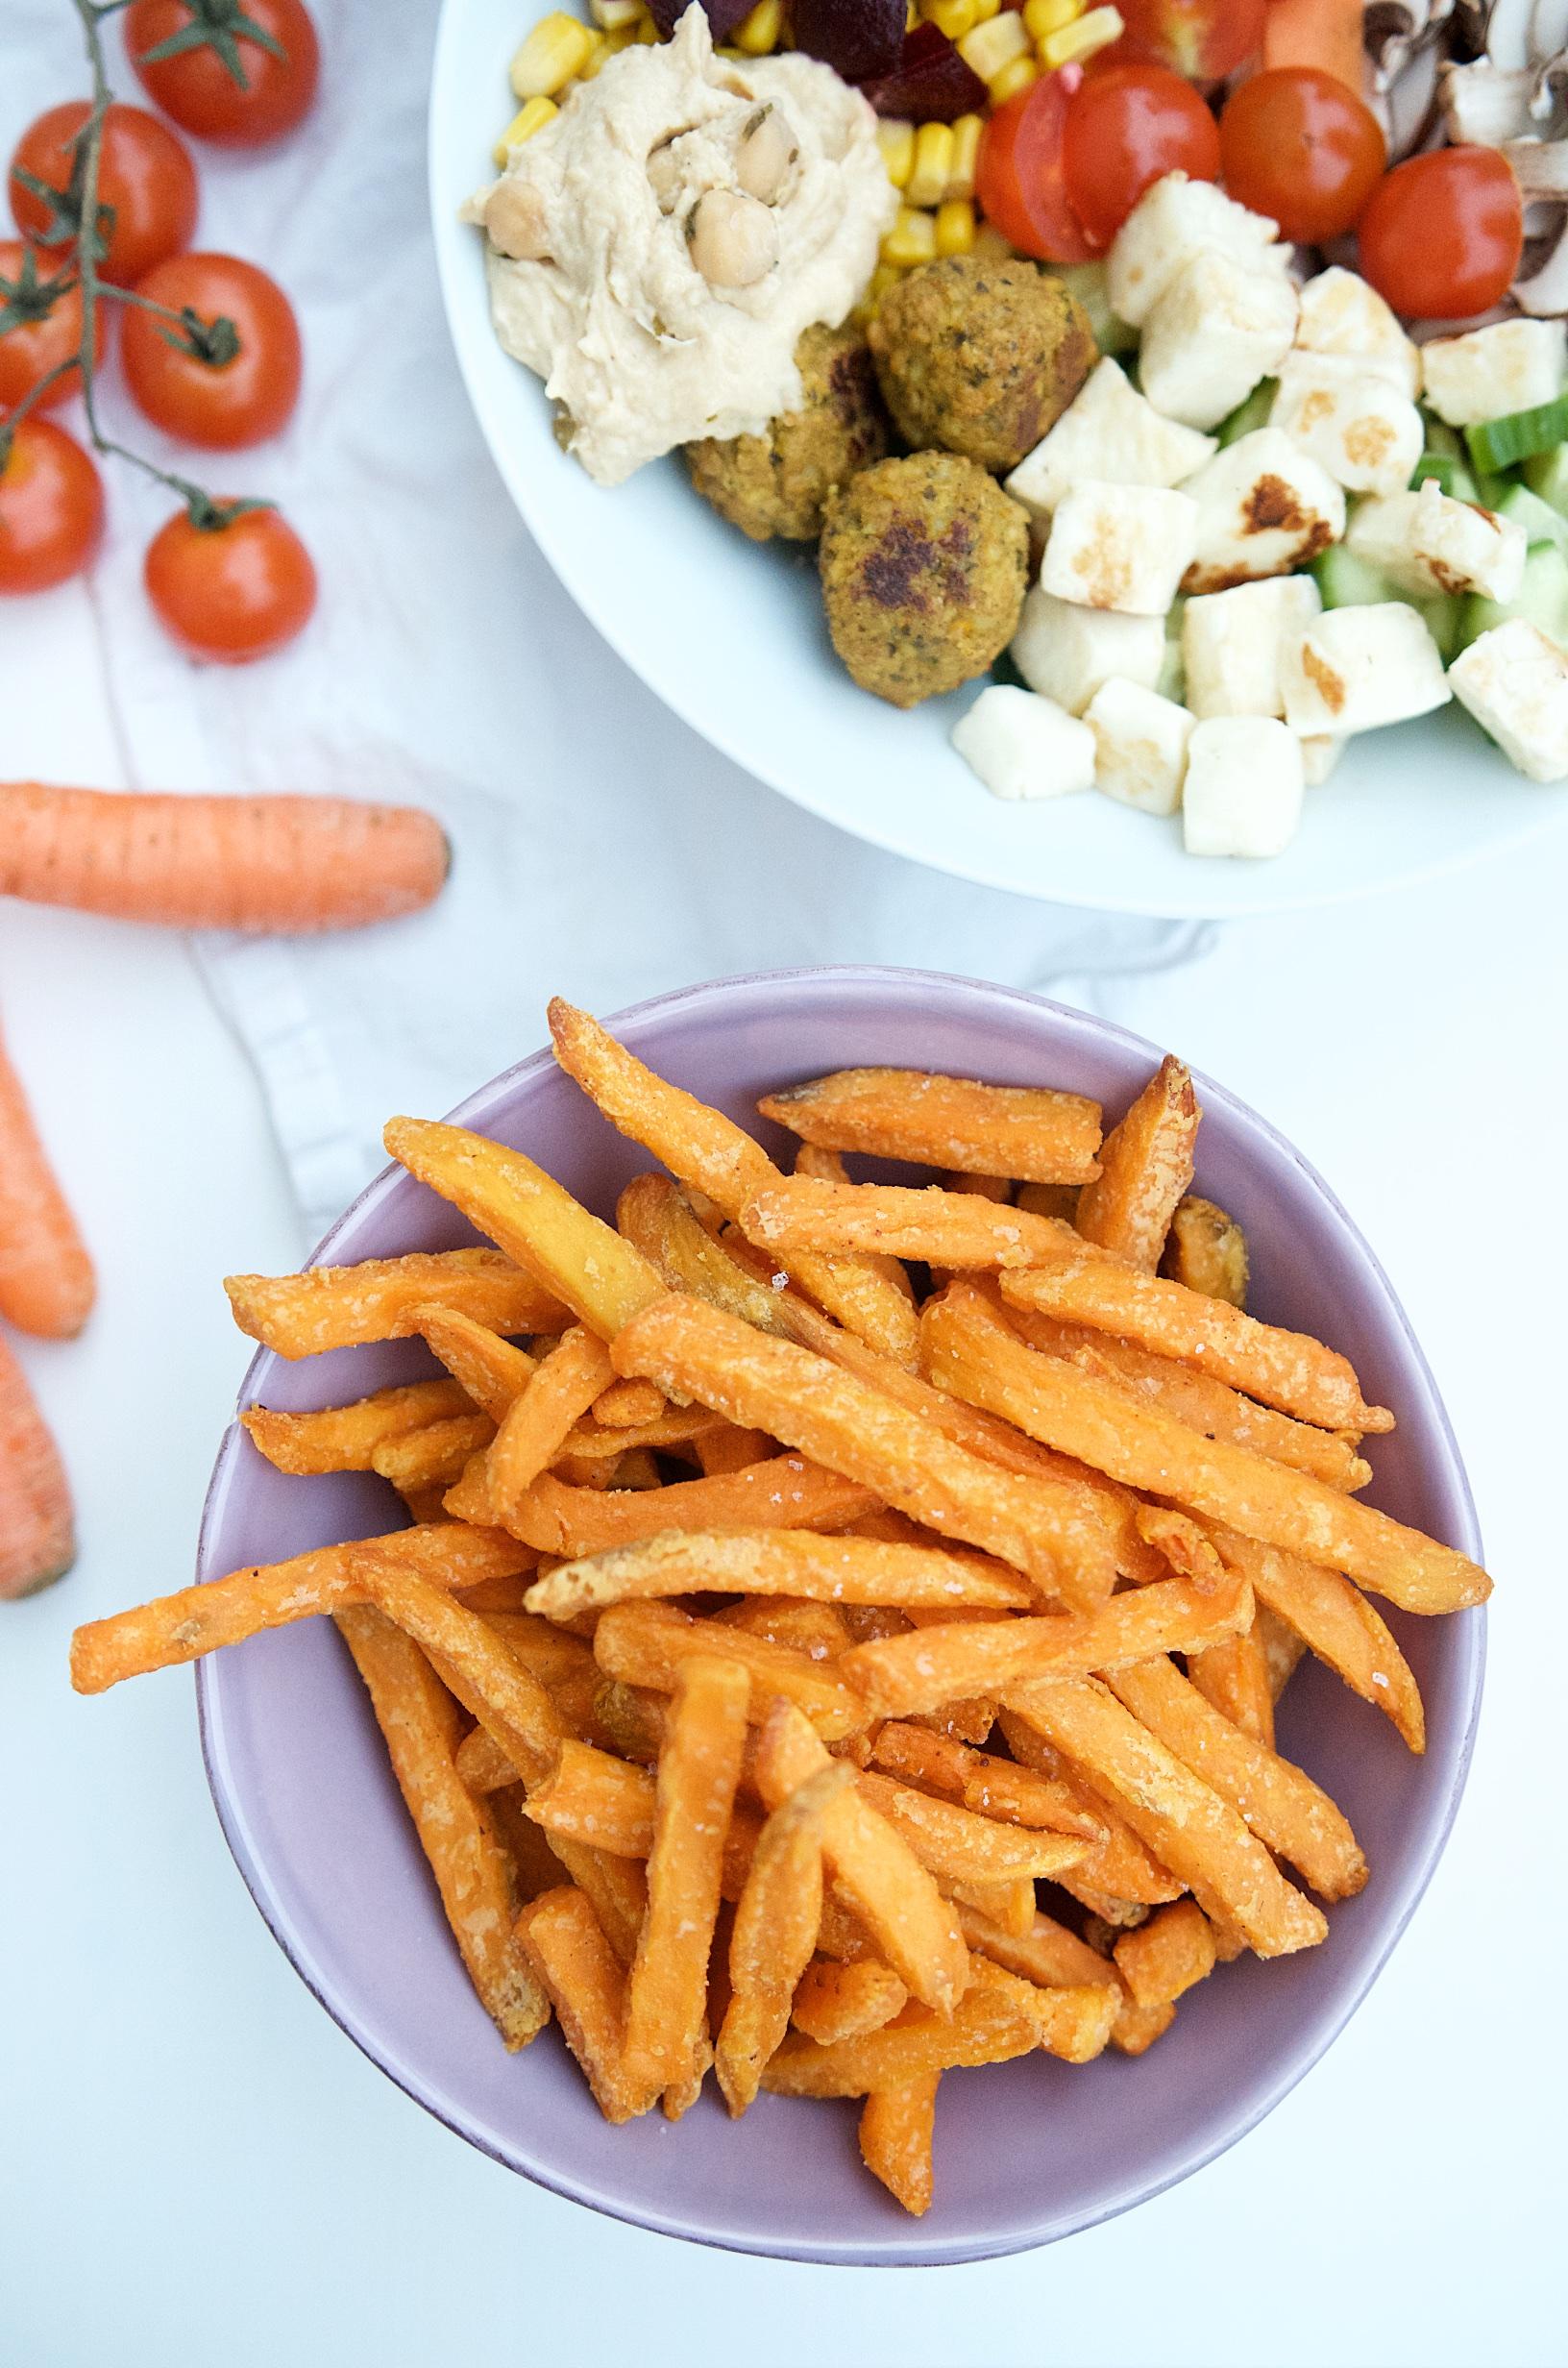 Knusprige Süßkartoffelpommes aus dem Backofen | Pinkepank